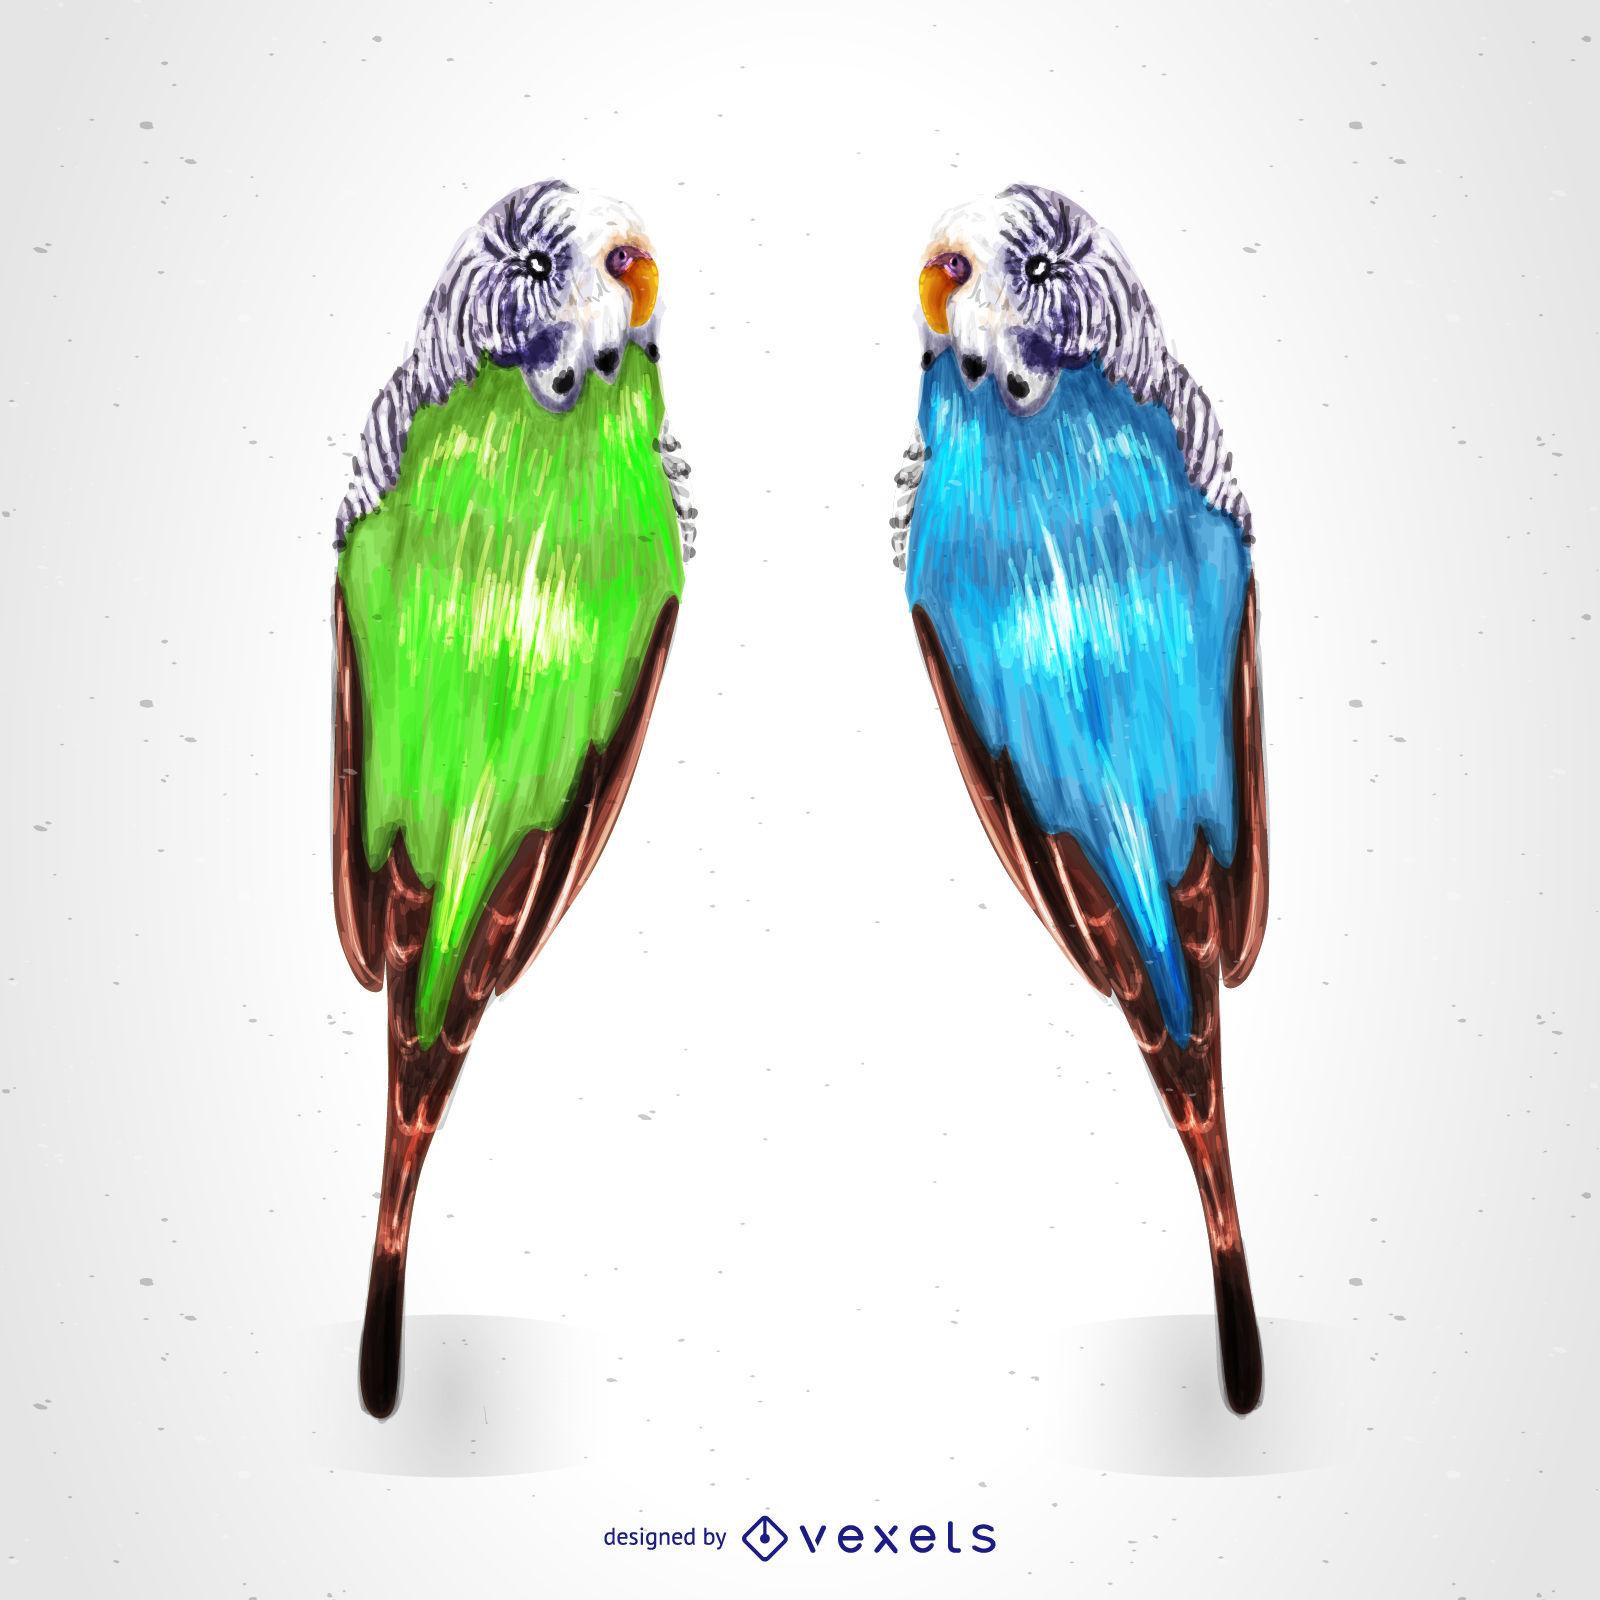 1600x1600 Tropical Parrots Drawing